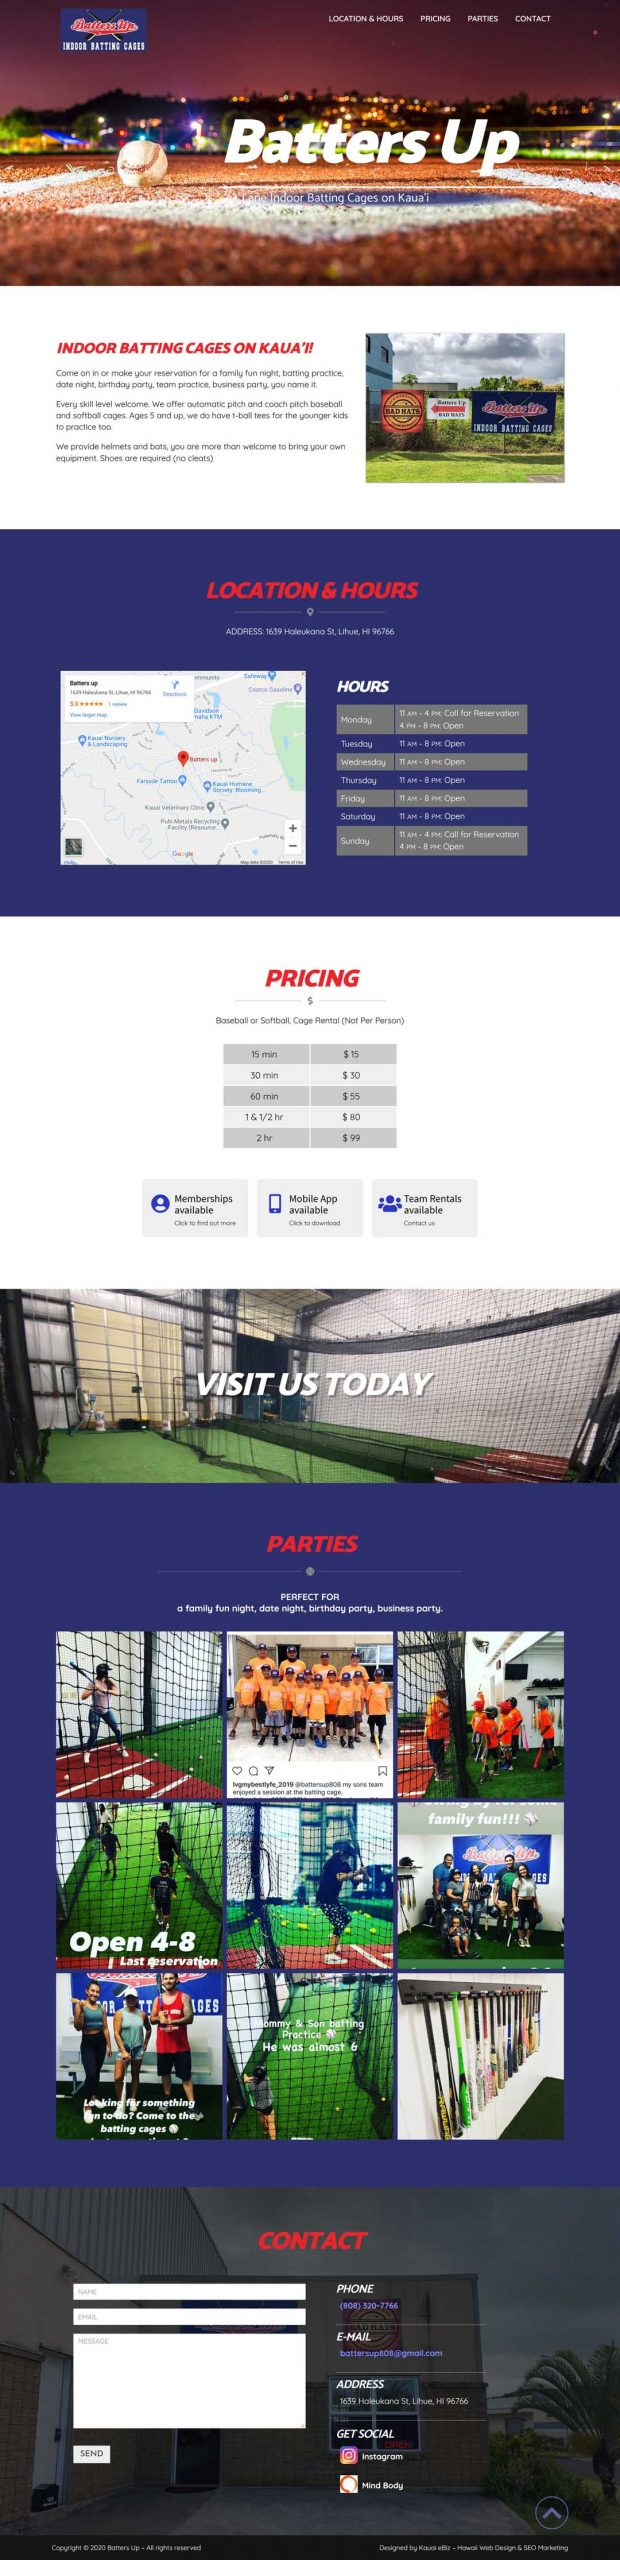 Baseball Batting Cage Website Kauai